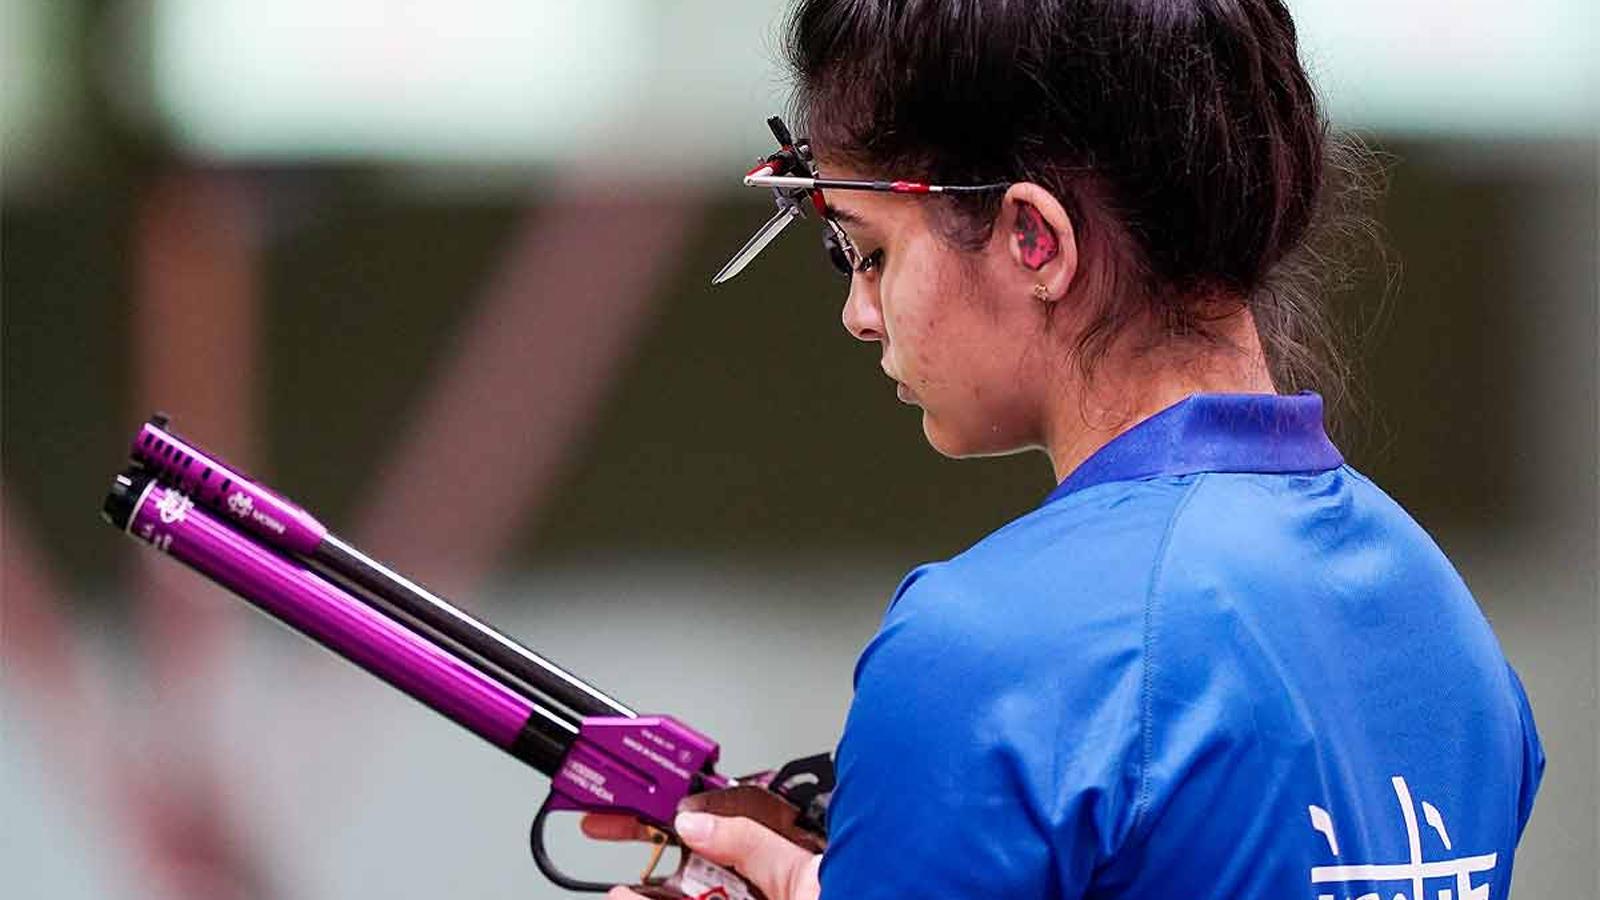 tokyo-olympics-manu-bhaker-yashaswini-deswal-miss-womens-10m-air-pistol-finals